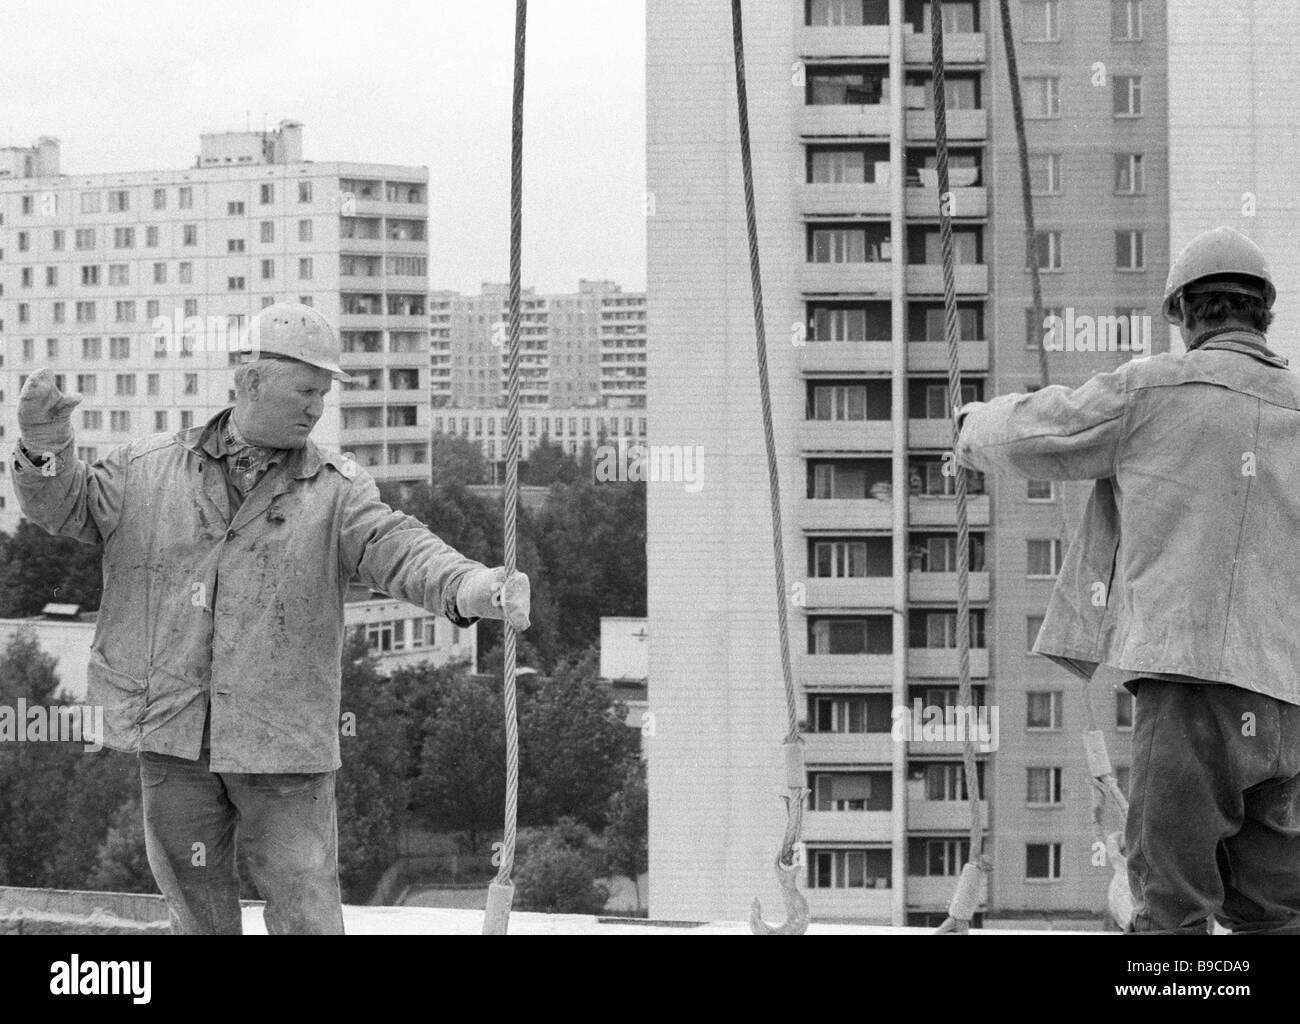 Workers building a 17 storey apartment bloc in Orekhovo Borisovo - Stock Image